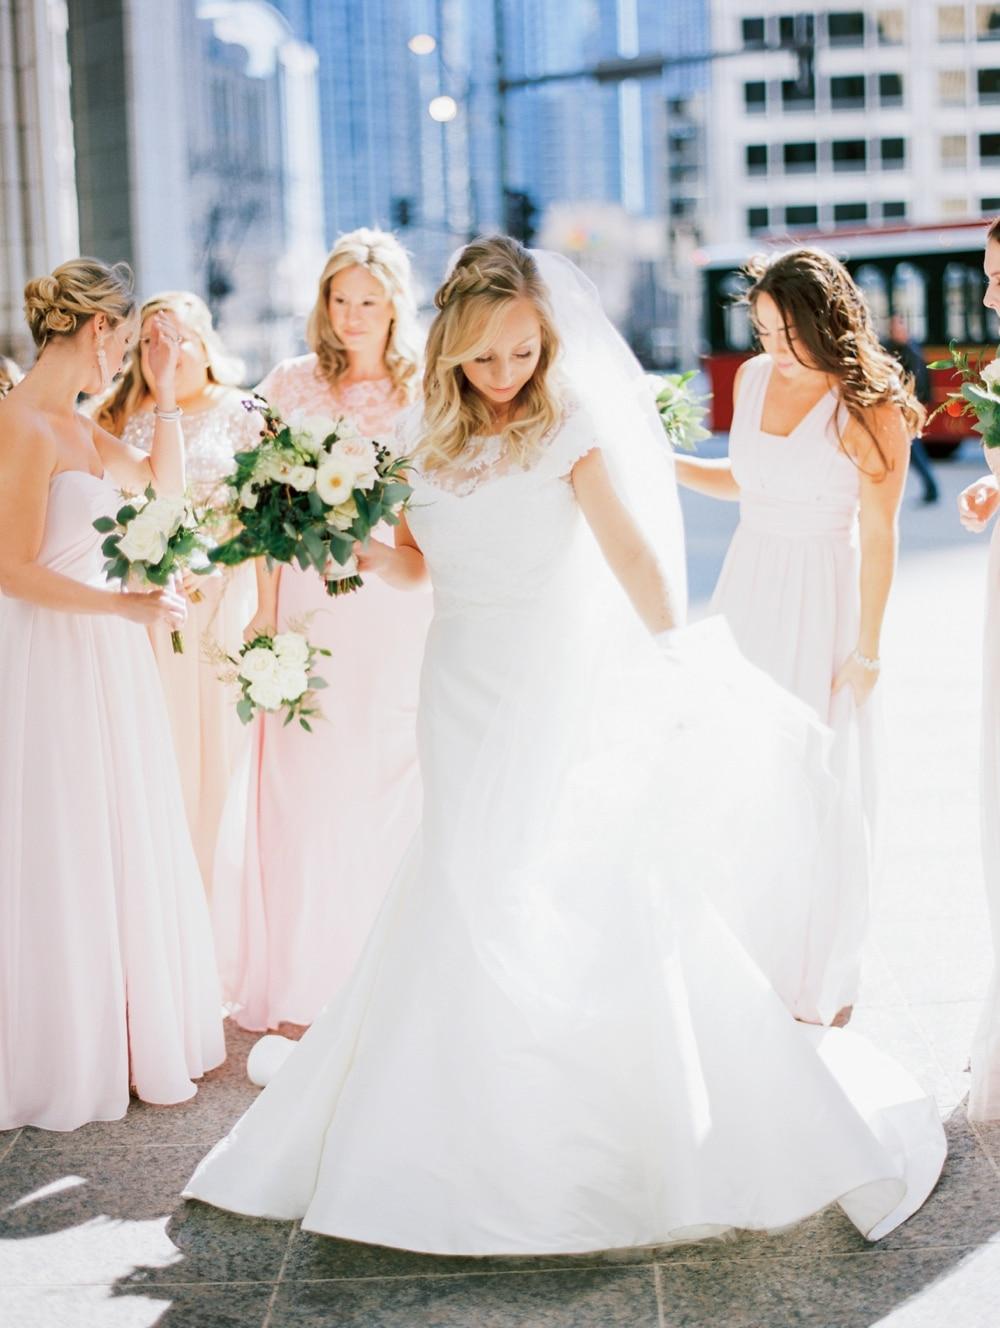 kristin-la-voie-photography-Cafe-Brauer-Chicago-Wedding-Photographer-101